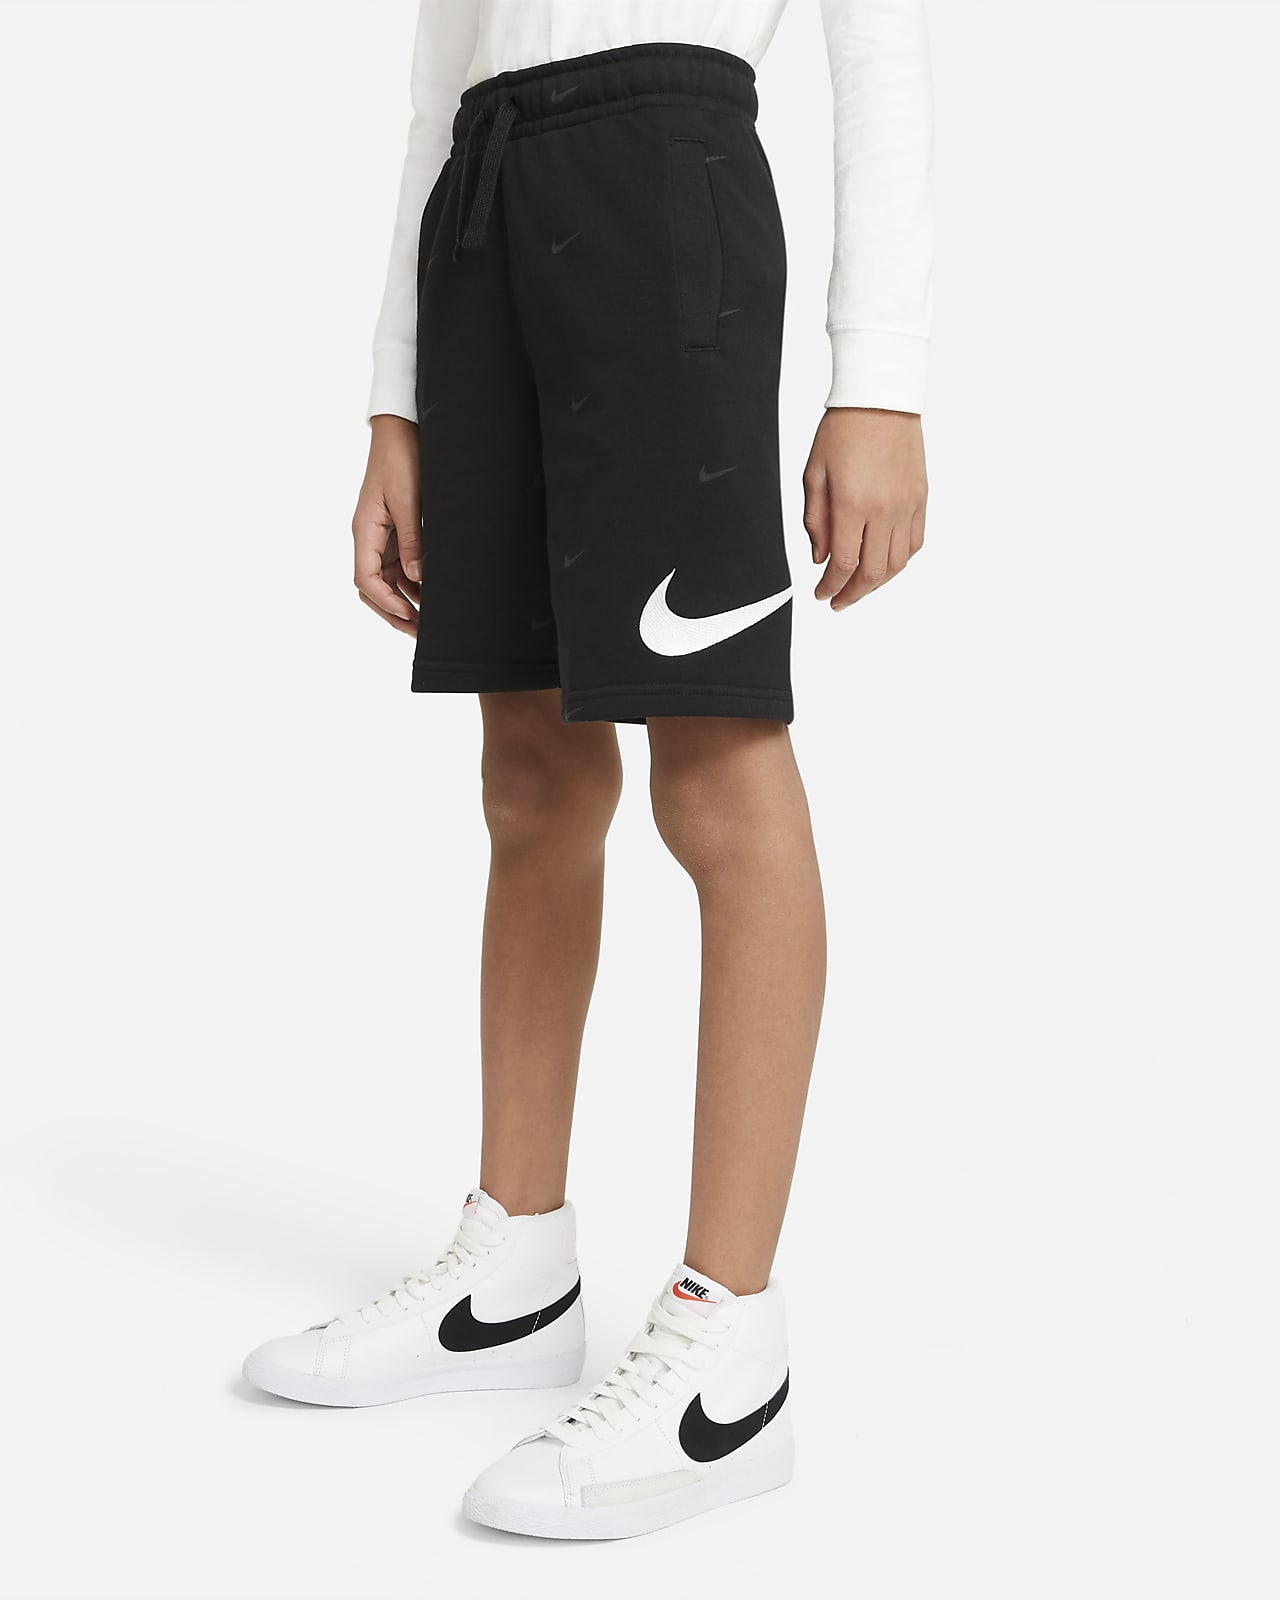 Shorts in French Terry Nike Sportswear Swoosh - Ragazzo